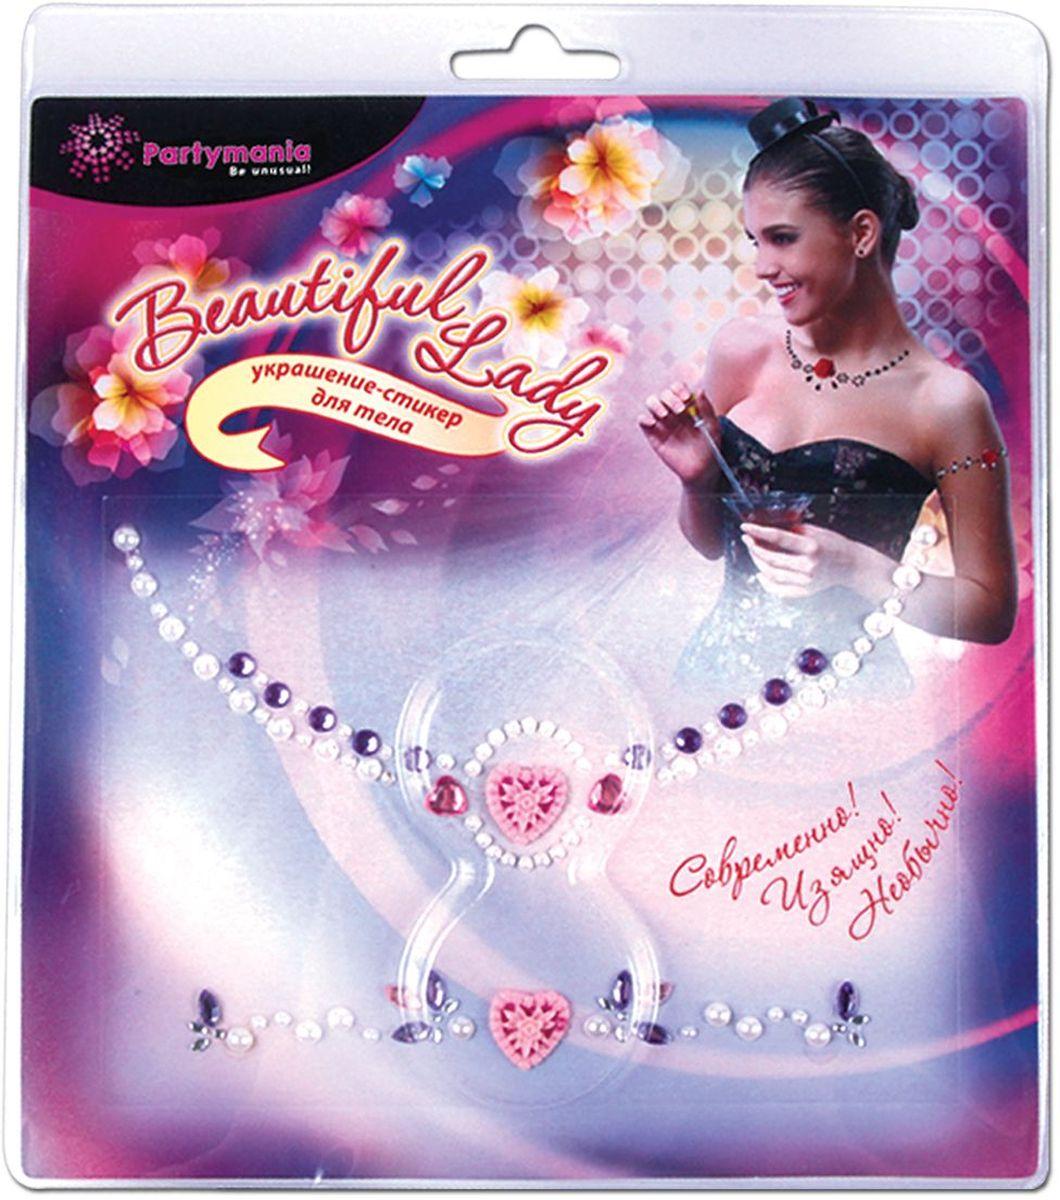 Partymania Украшение-стикер для тела 2 шт Beautiful Lady Сердечко the beautiful lady